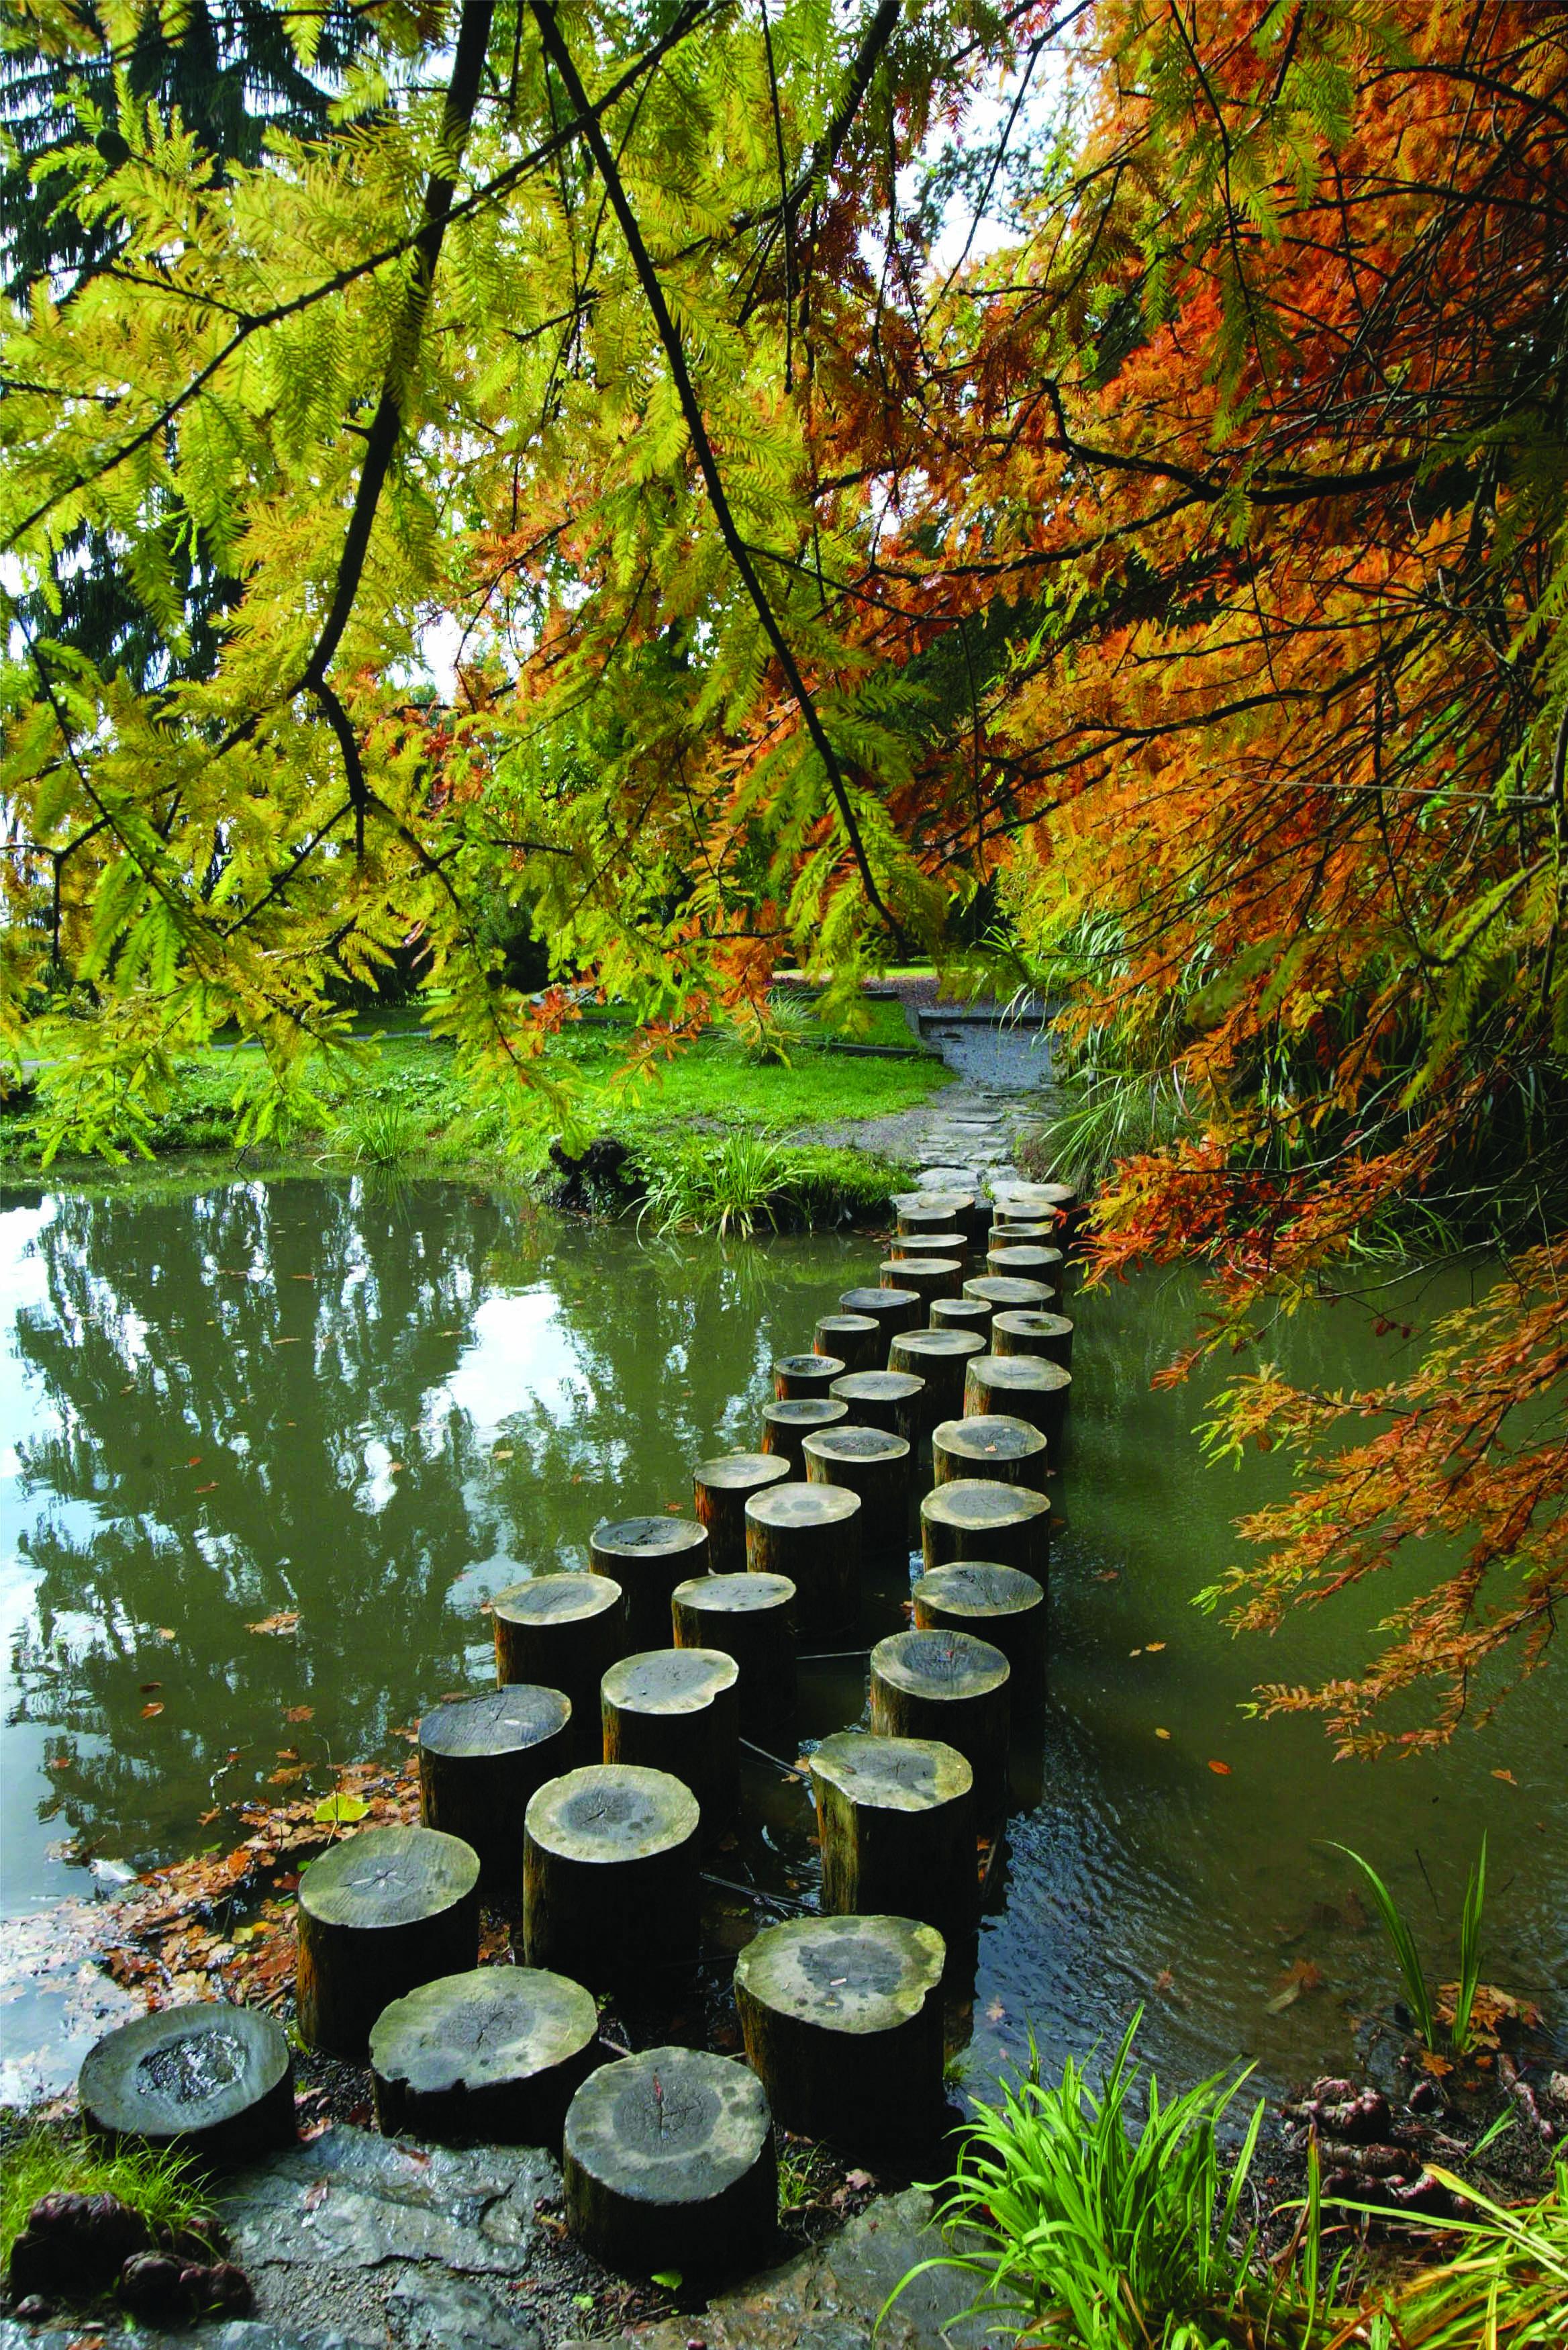 http://manjaribhatnagar.wordpress.com/2012/05/16/slovenia-the-emerald-country-2/